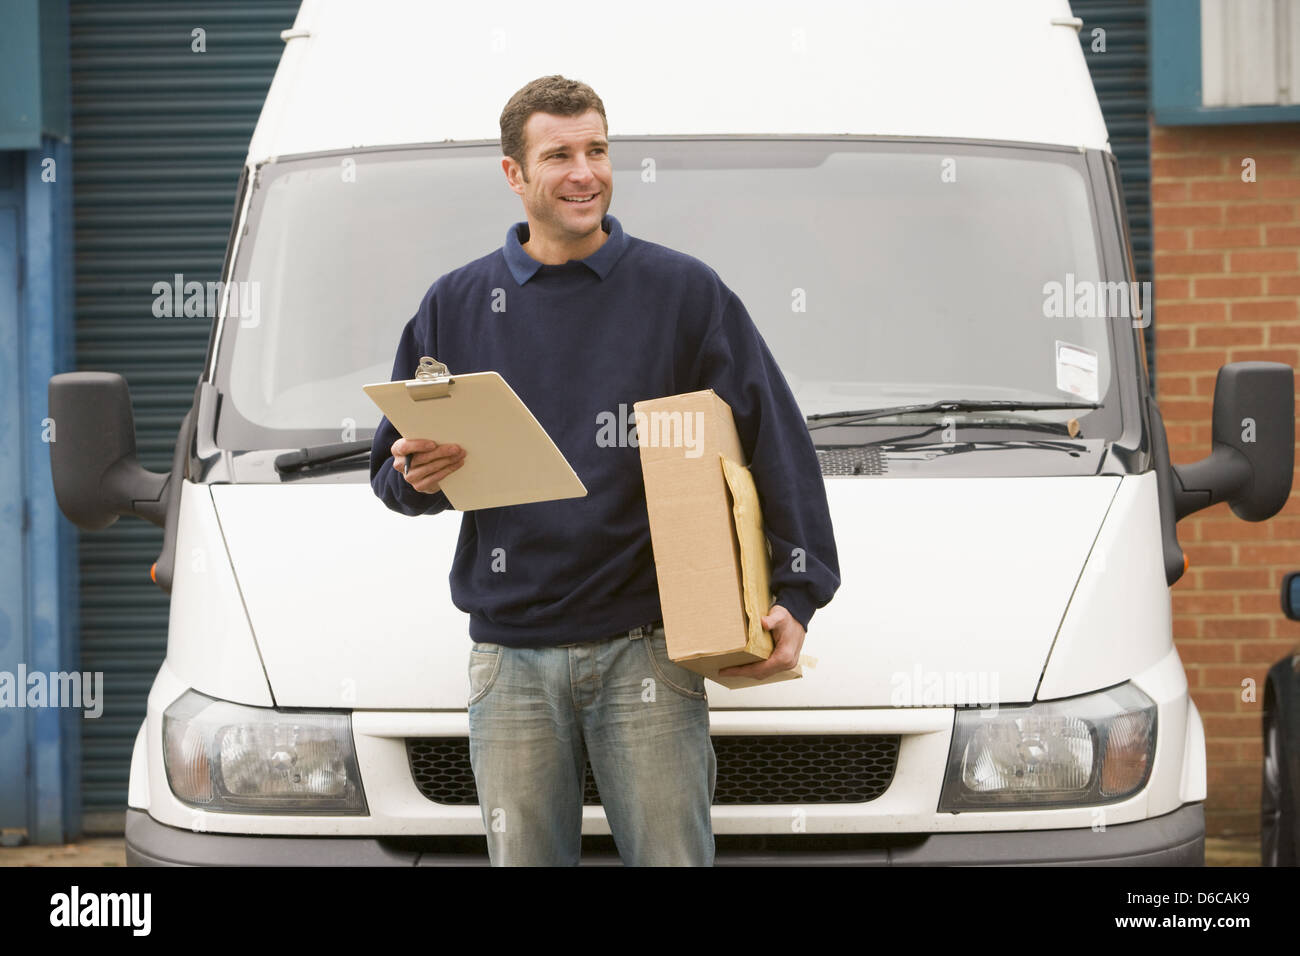 parcel service,messenger,delivery people - Stock Image